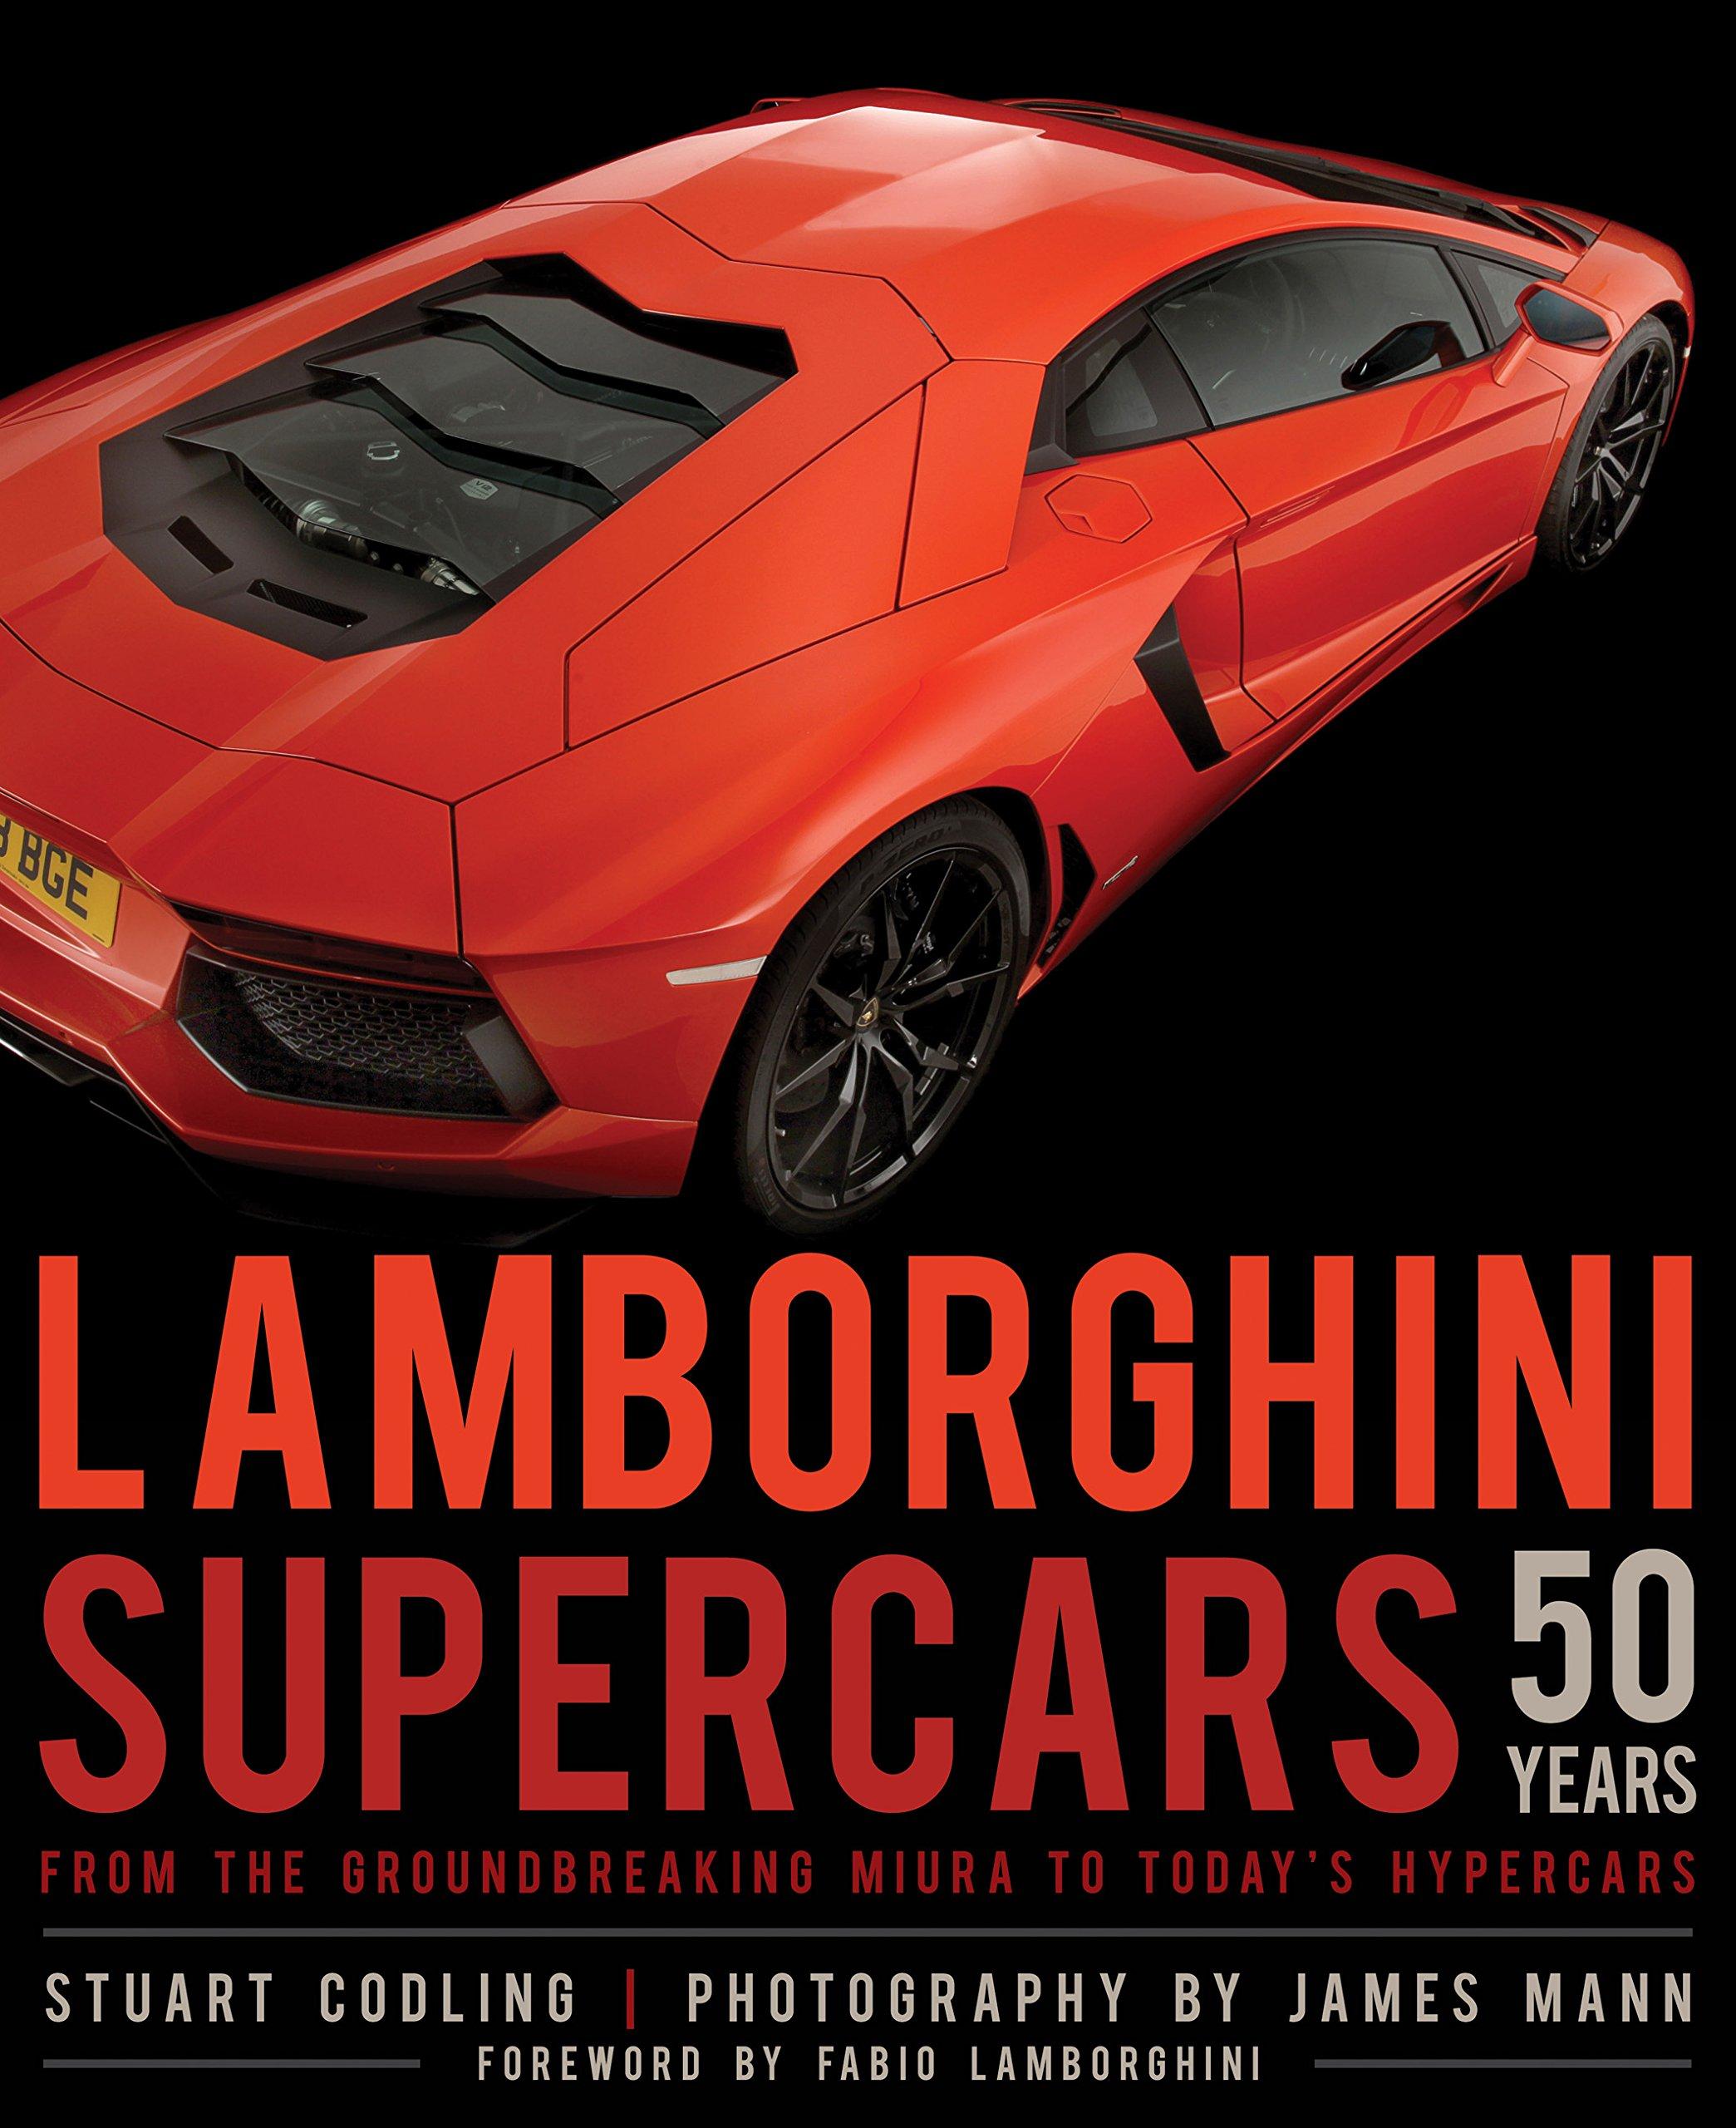 Lamborghini Supercars 50 Years: From the Groundbreaking Miura to Today's Hypercars - Foreword by Fabio Lamborghini pdf